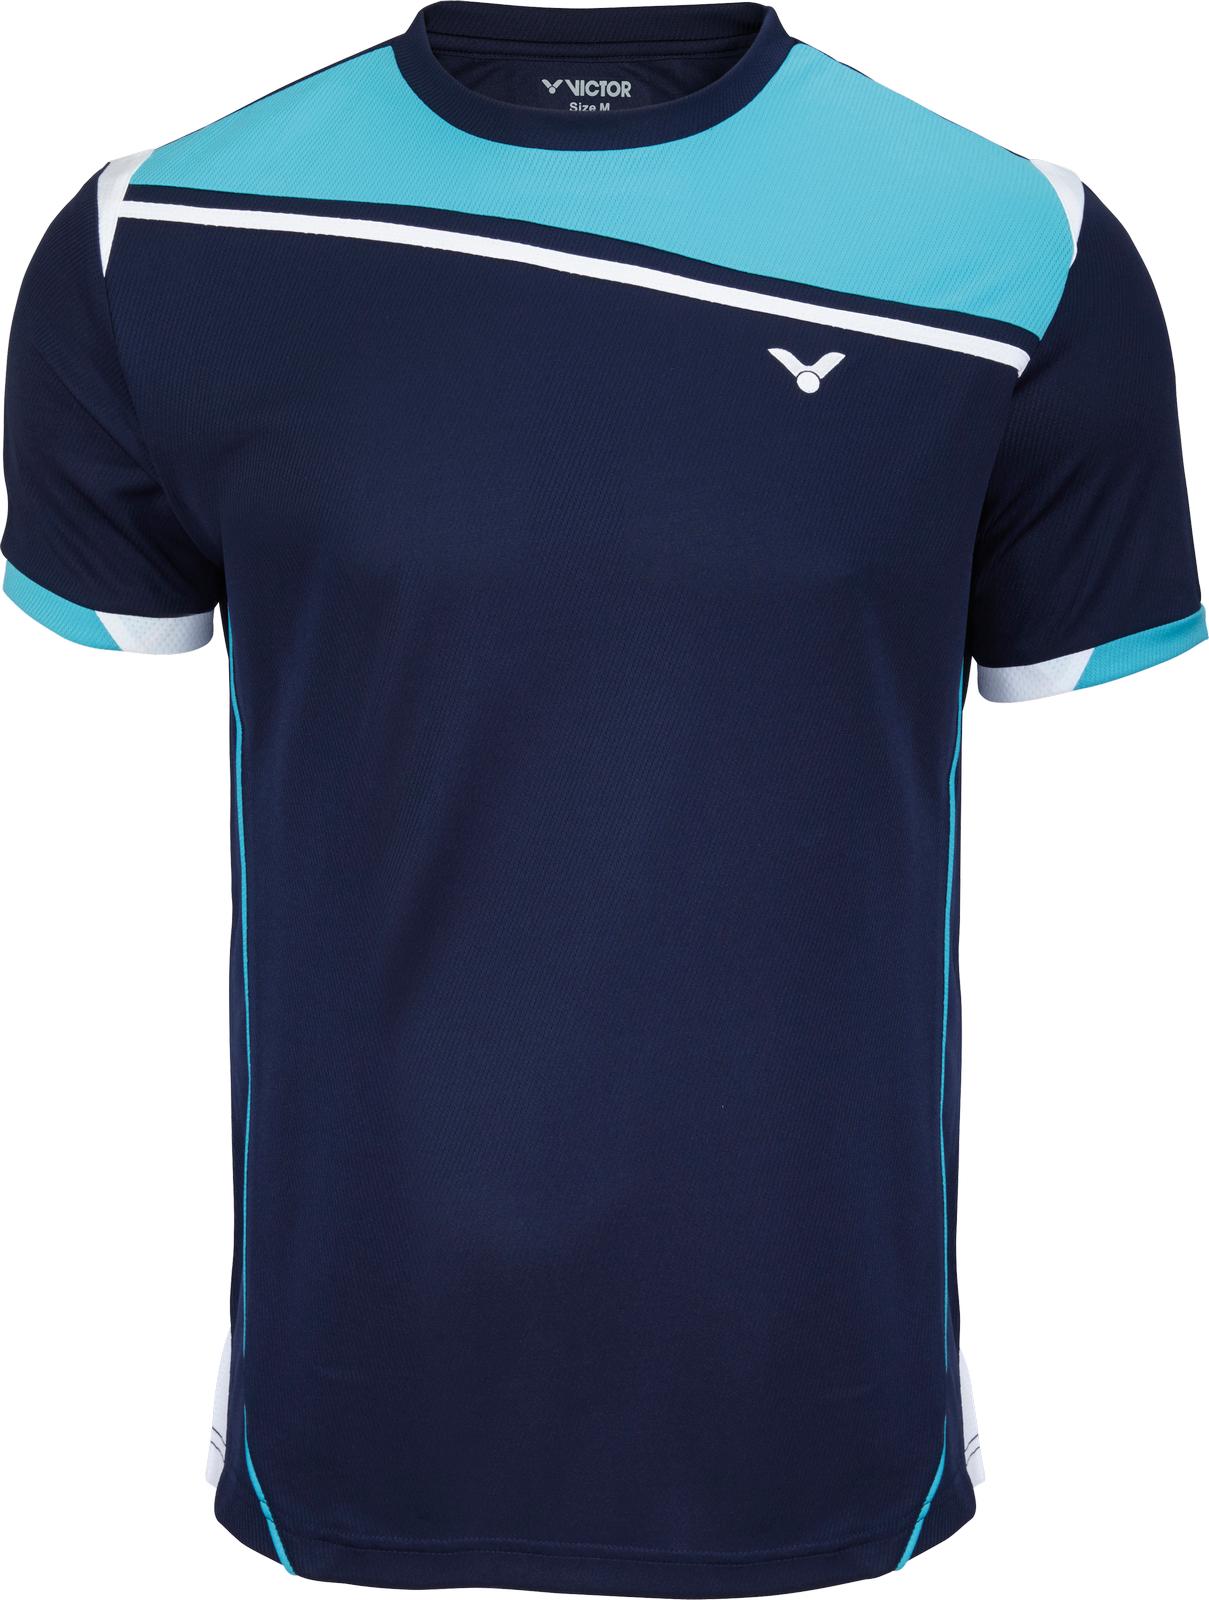 Victor T-Shirt Function Unisex blue 6966